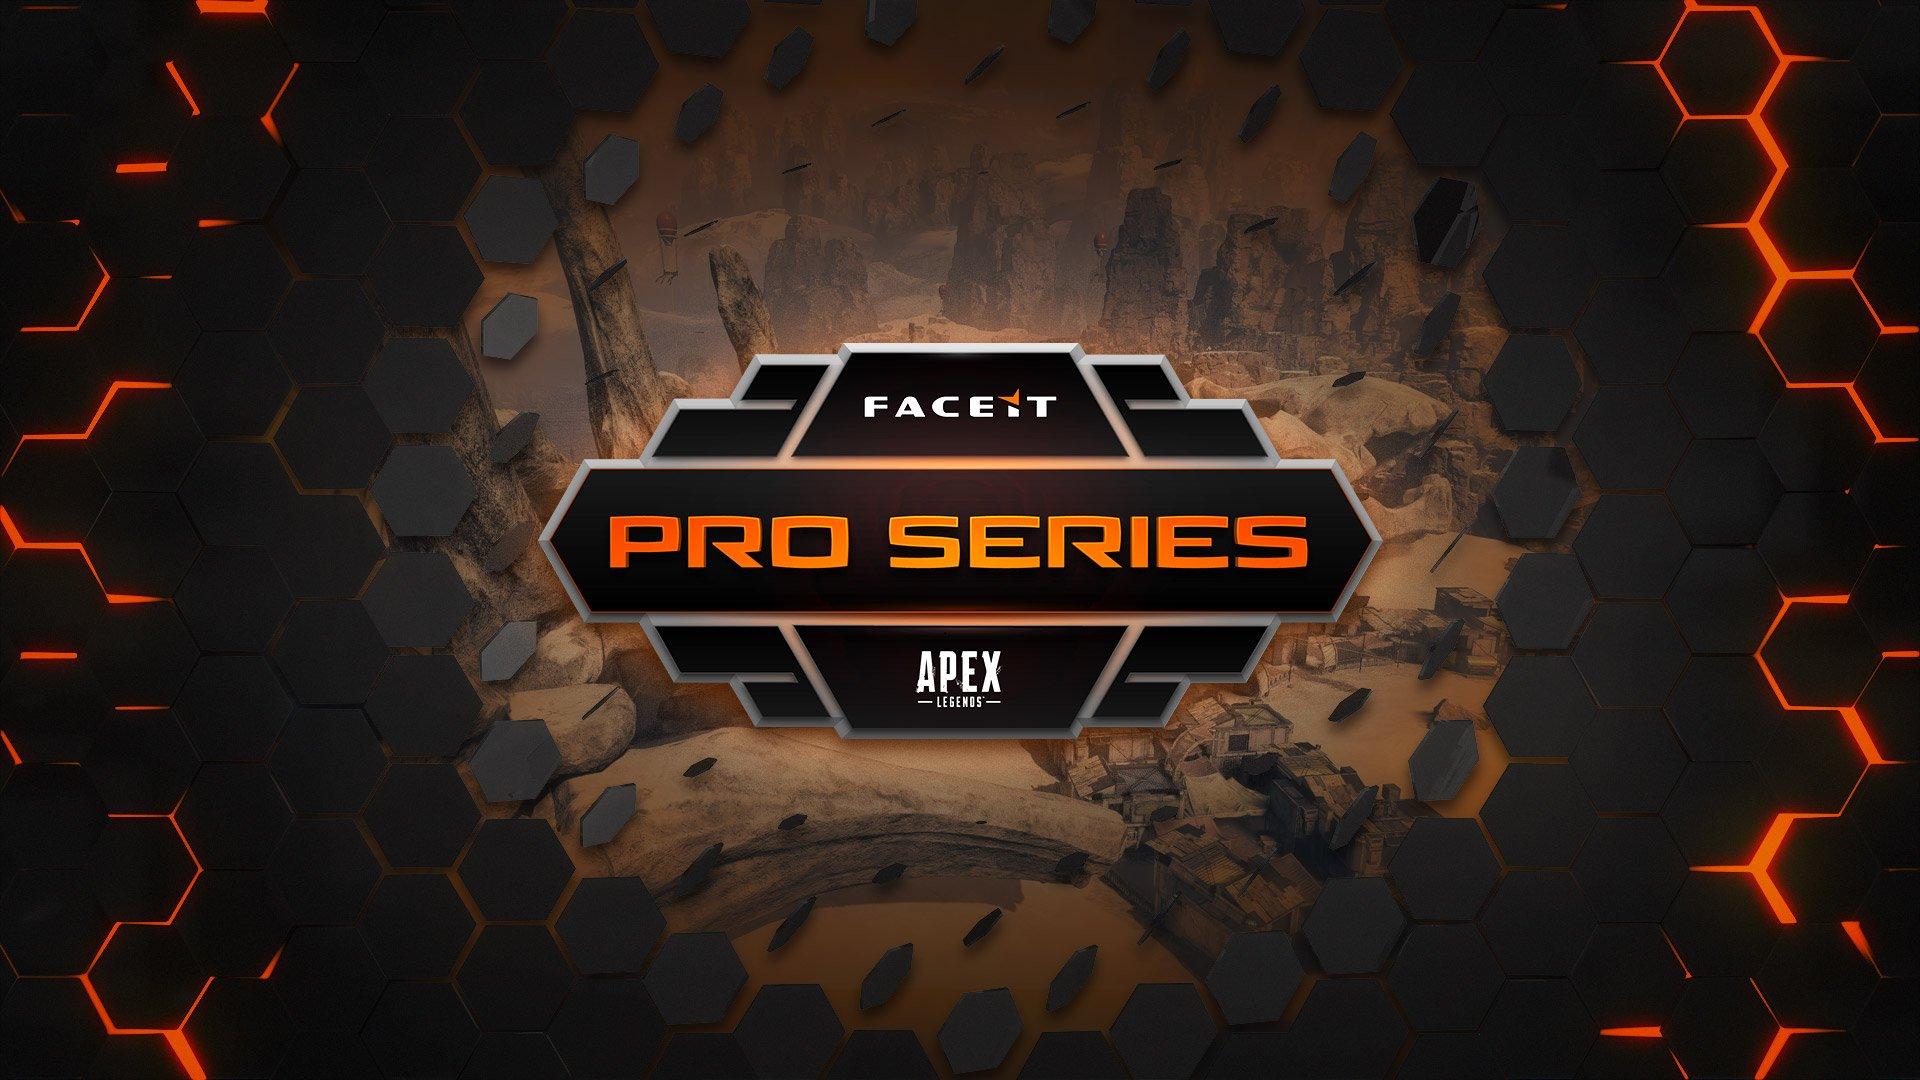 【Apexプロリーグ】FACEITプロシリーズ第1回目の結果発表!